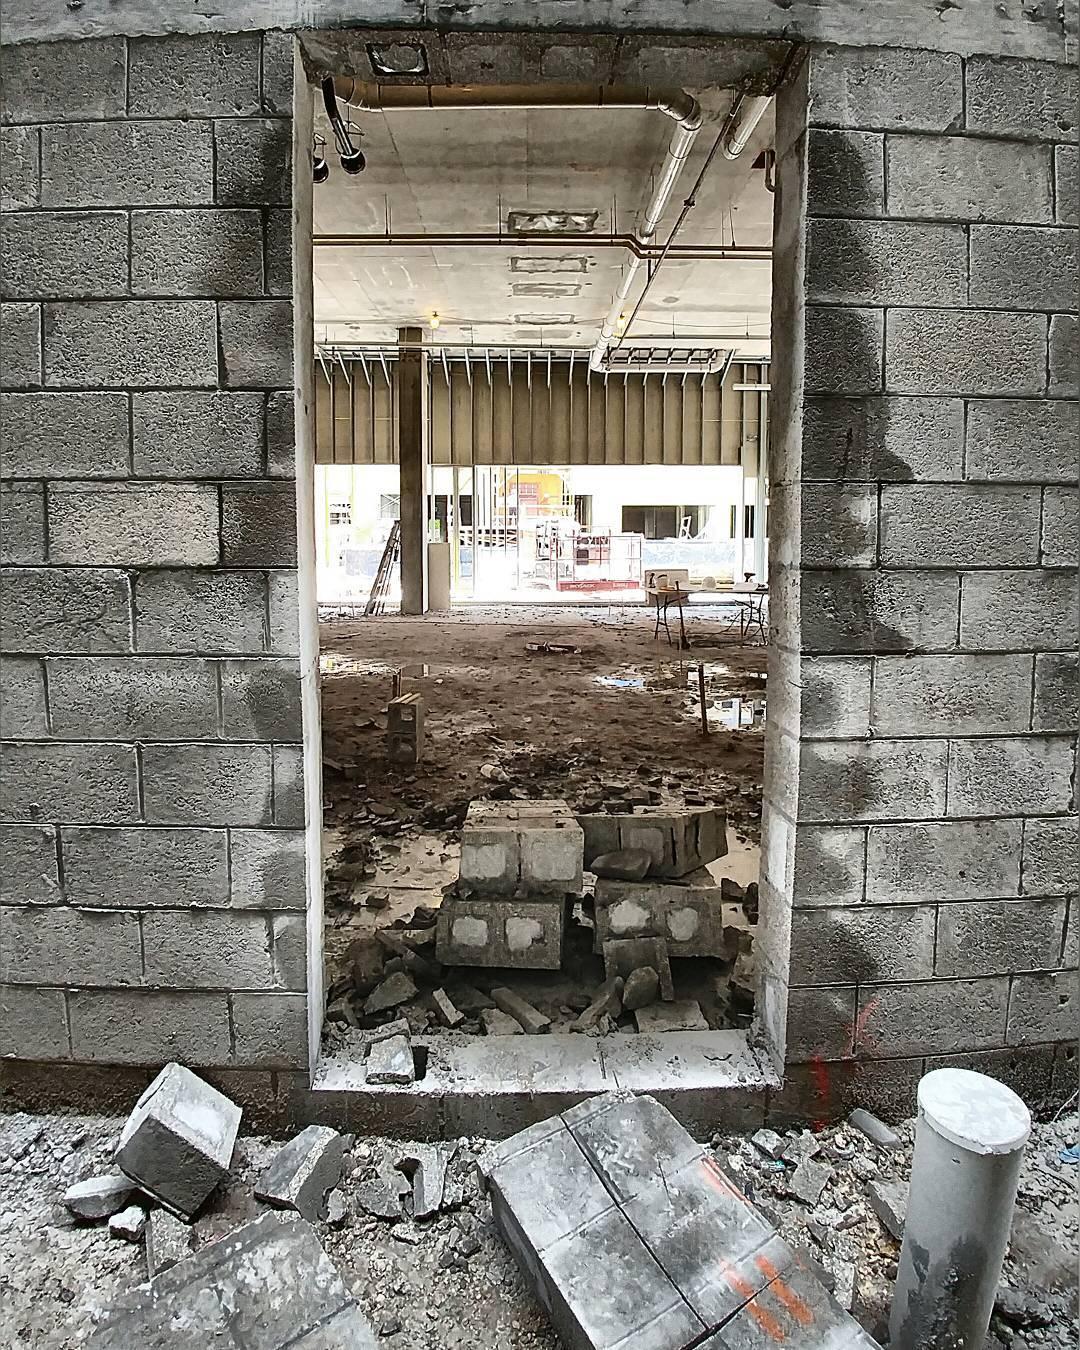 Demolition Concrete Wall : Wall opening concretecutting construction miami